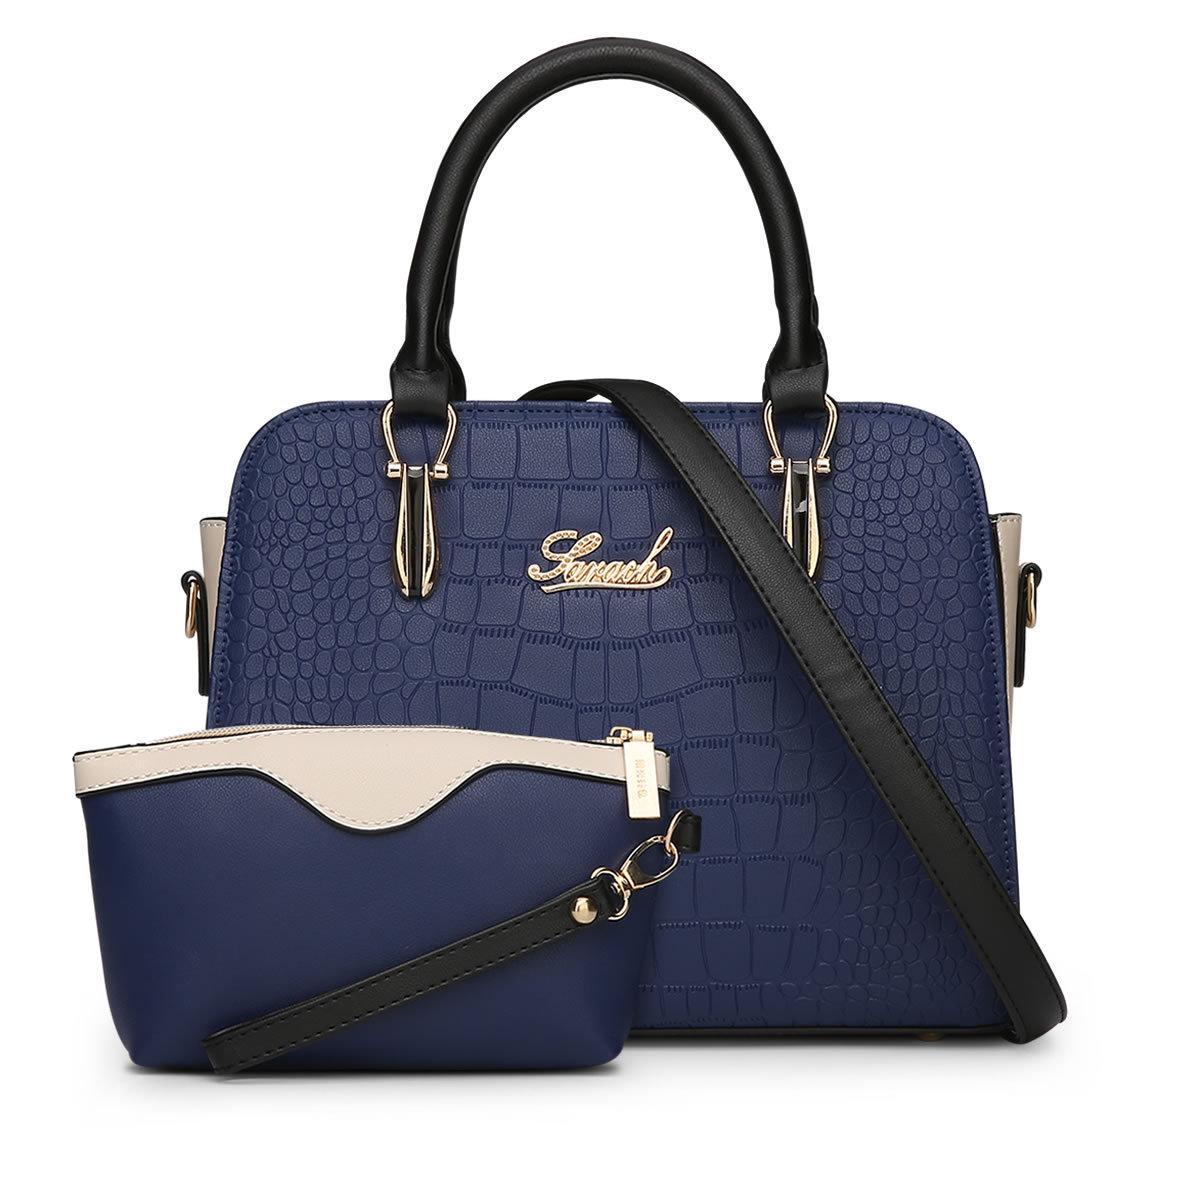 2 bag New Fashion American Women Messenger Bags Alligator Pattern women bag  high quality purses and handbags dollar price Q5